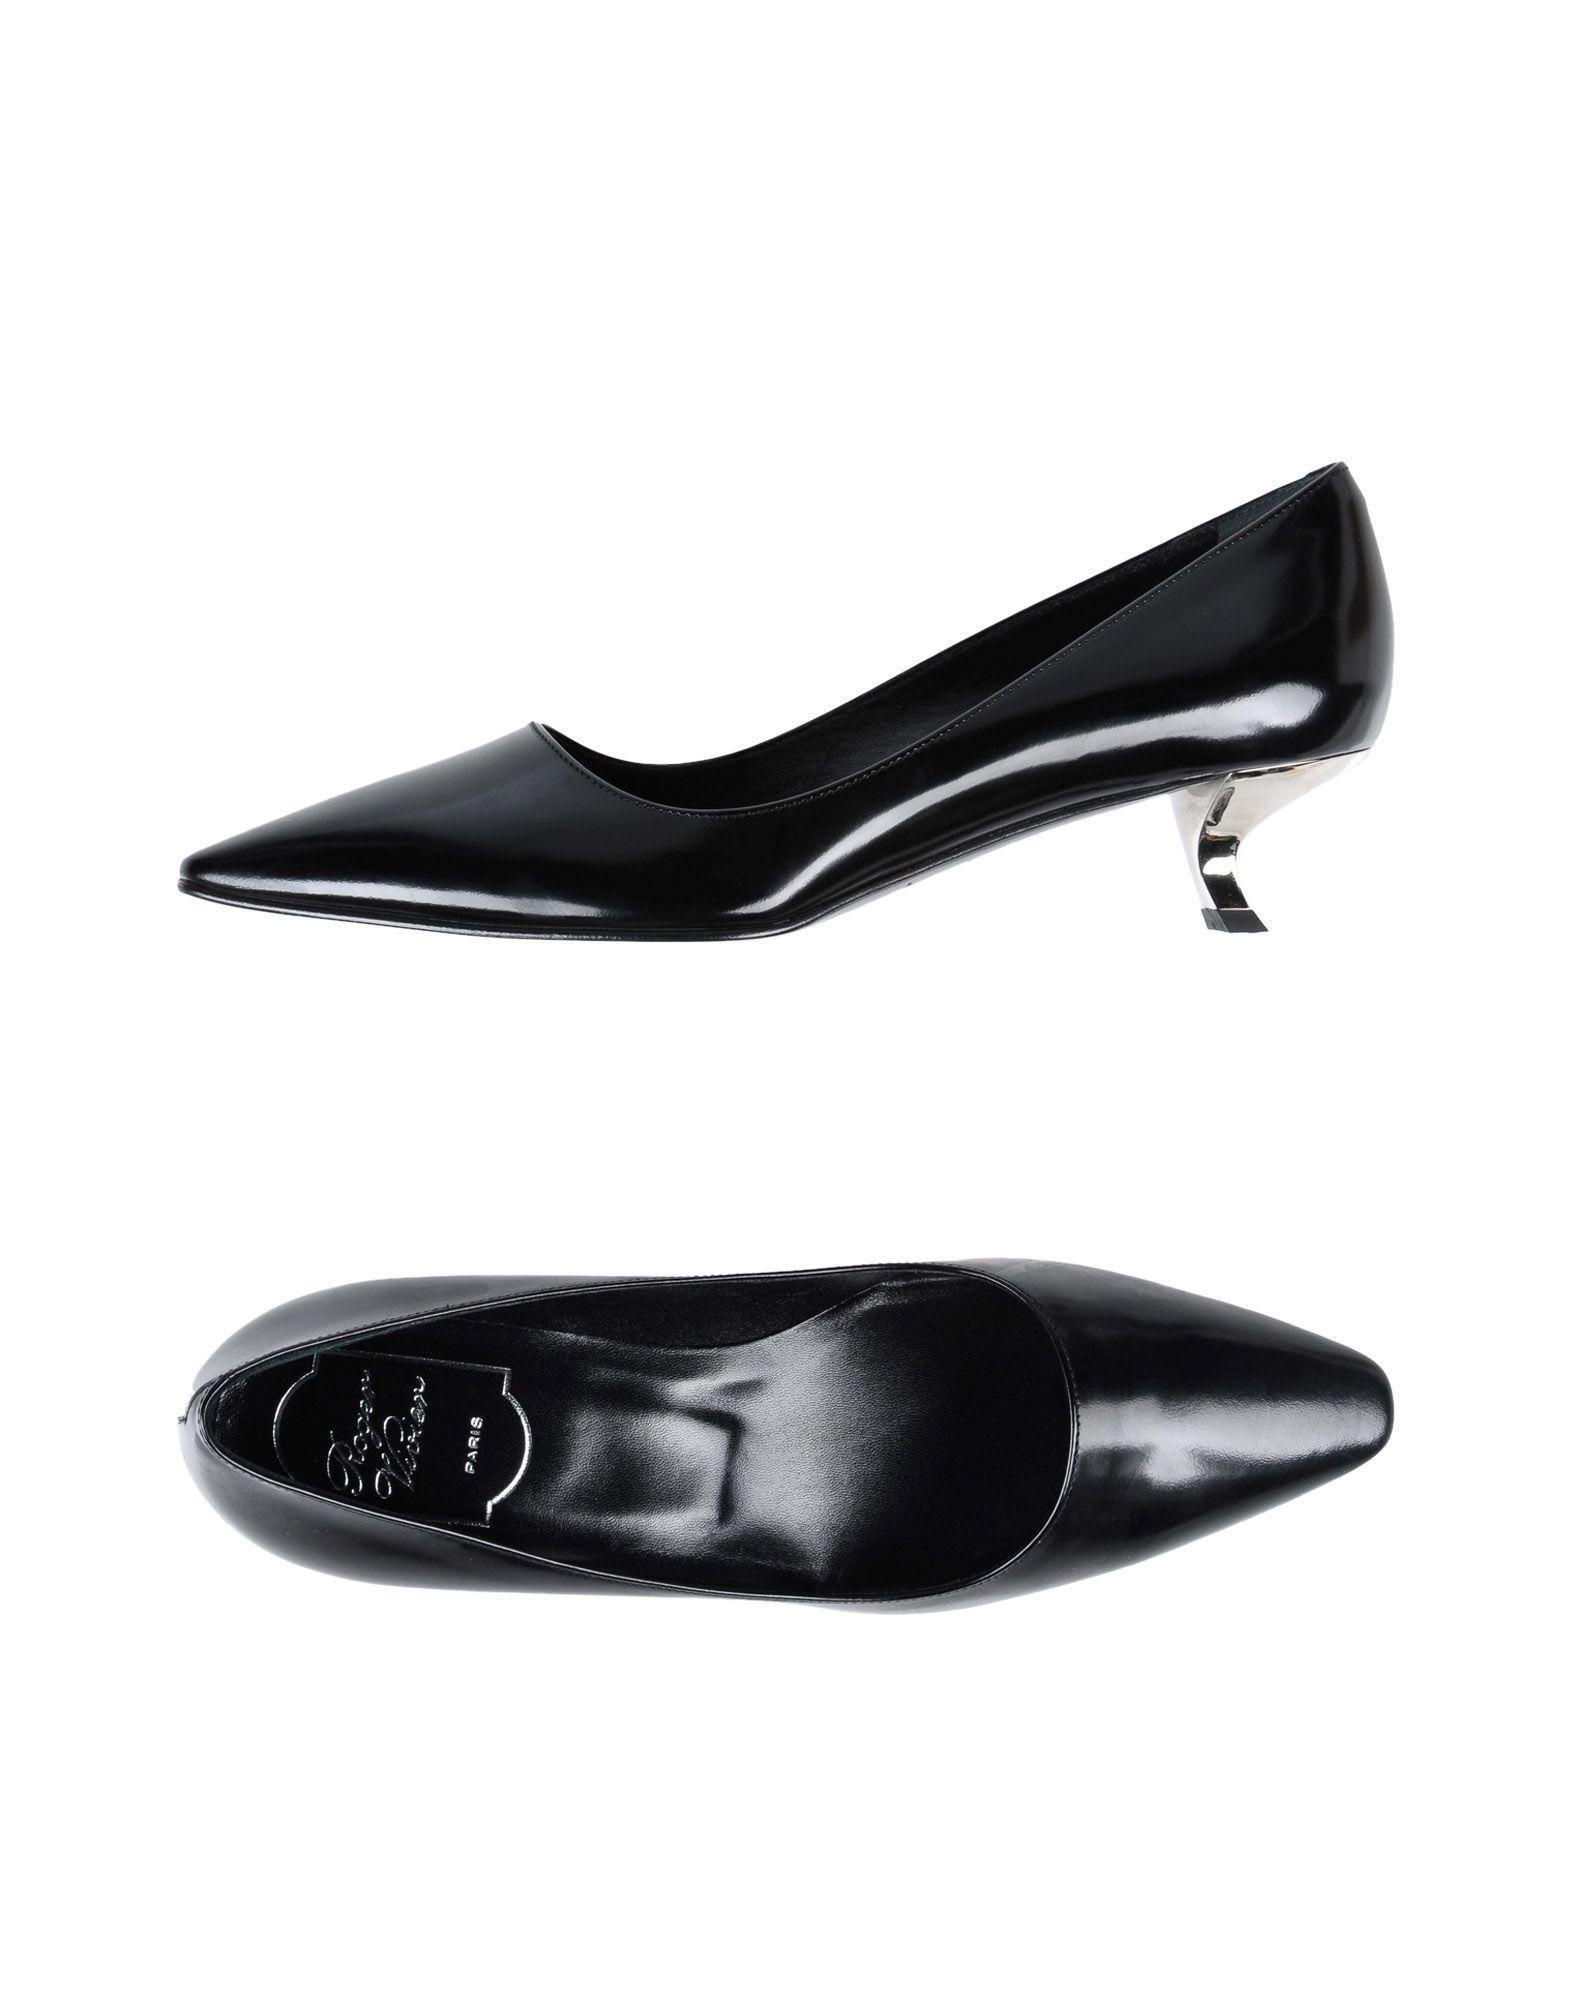 Rabatt Schuhe Roger Vivier Pumps Damen  11501019VI